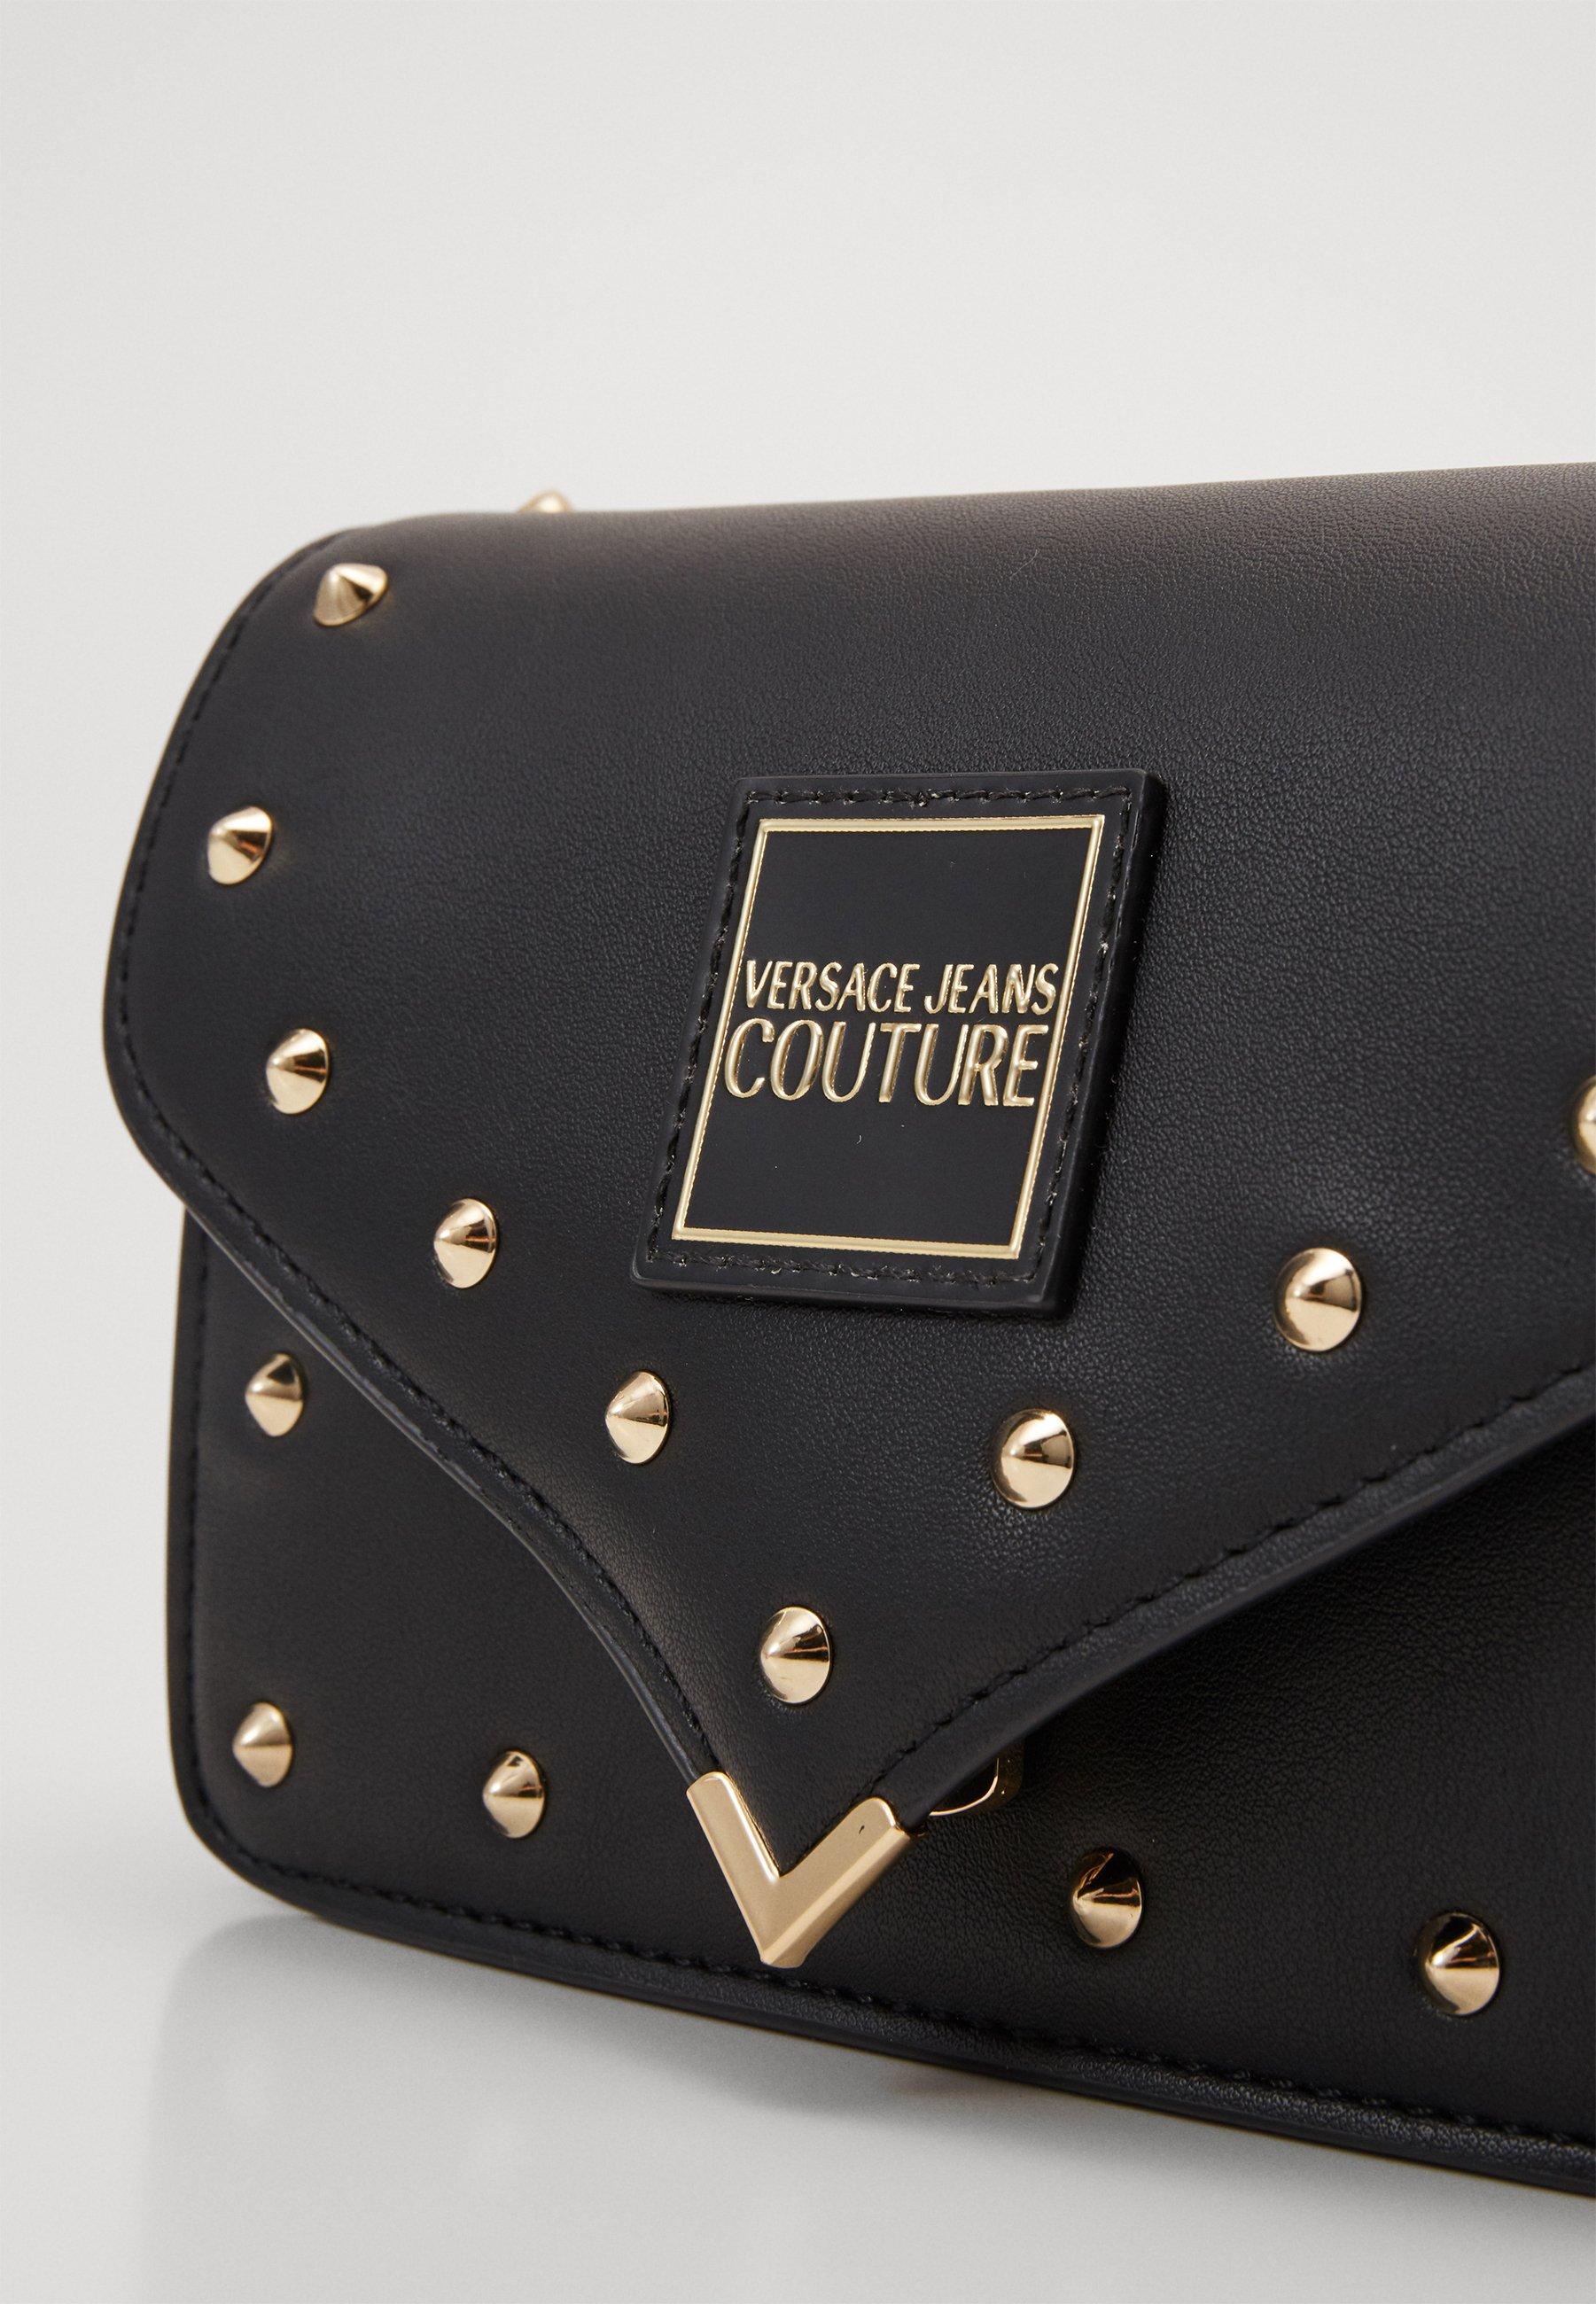 Versace Jeans Couture Mini Crossbody Studded - Umhängetasche Nero/oro/mehrfarbig